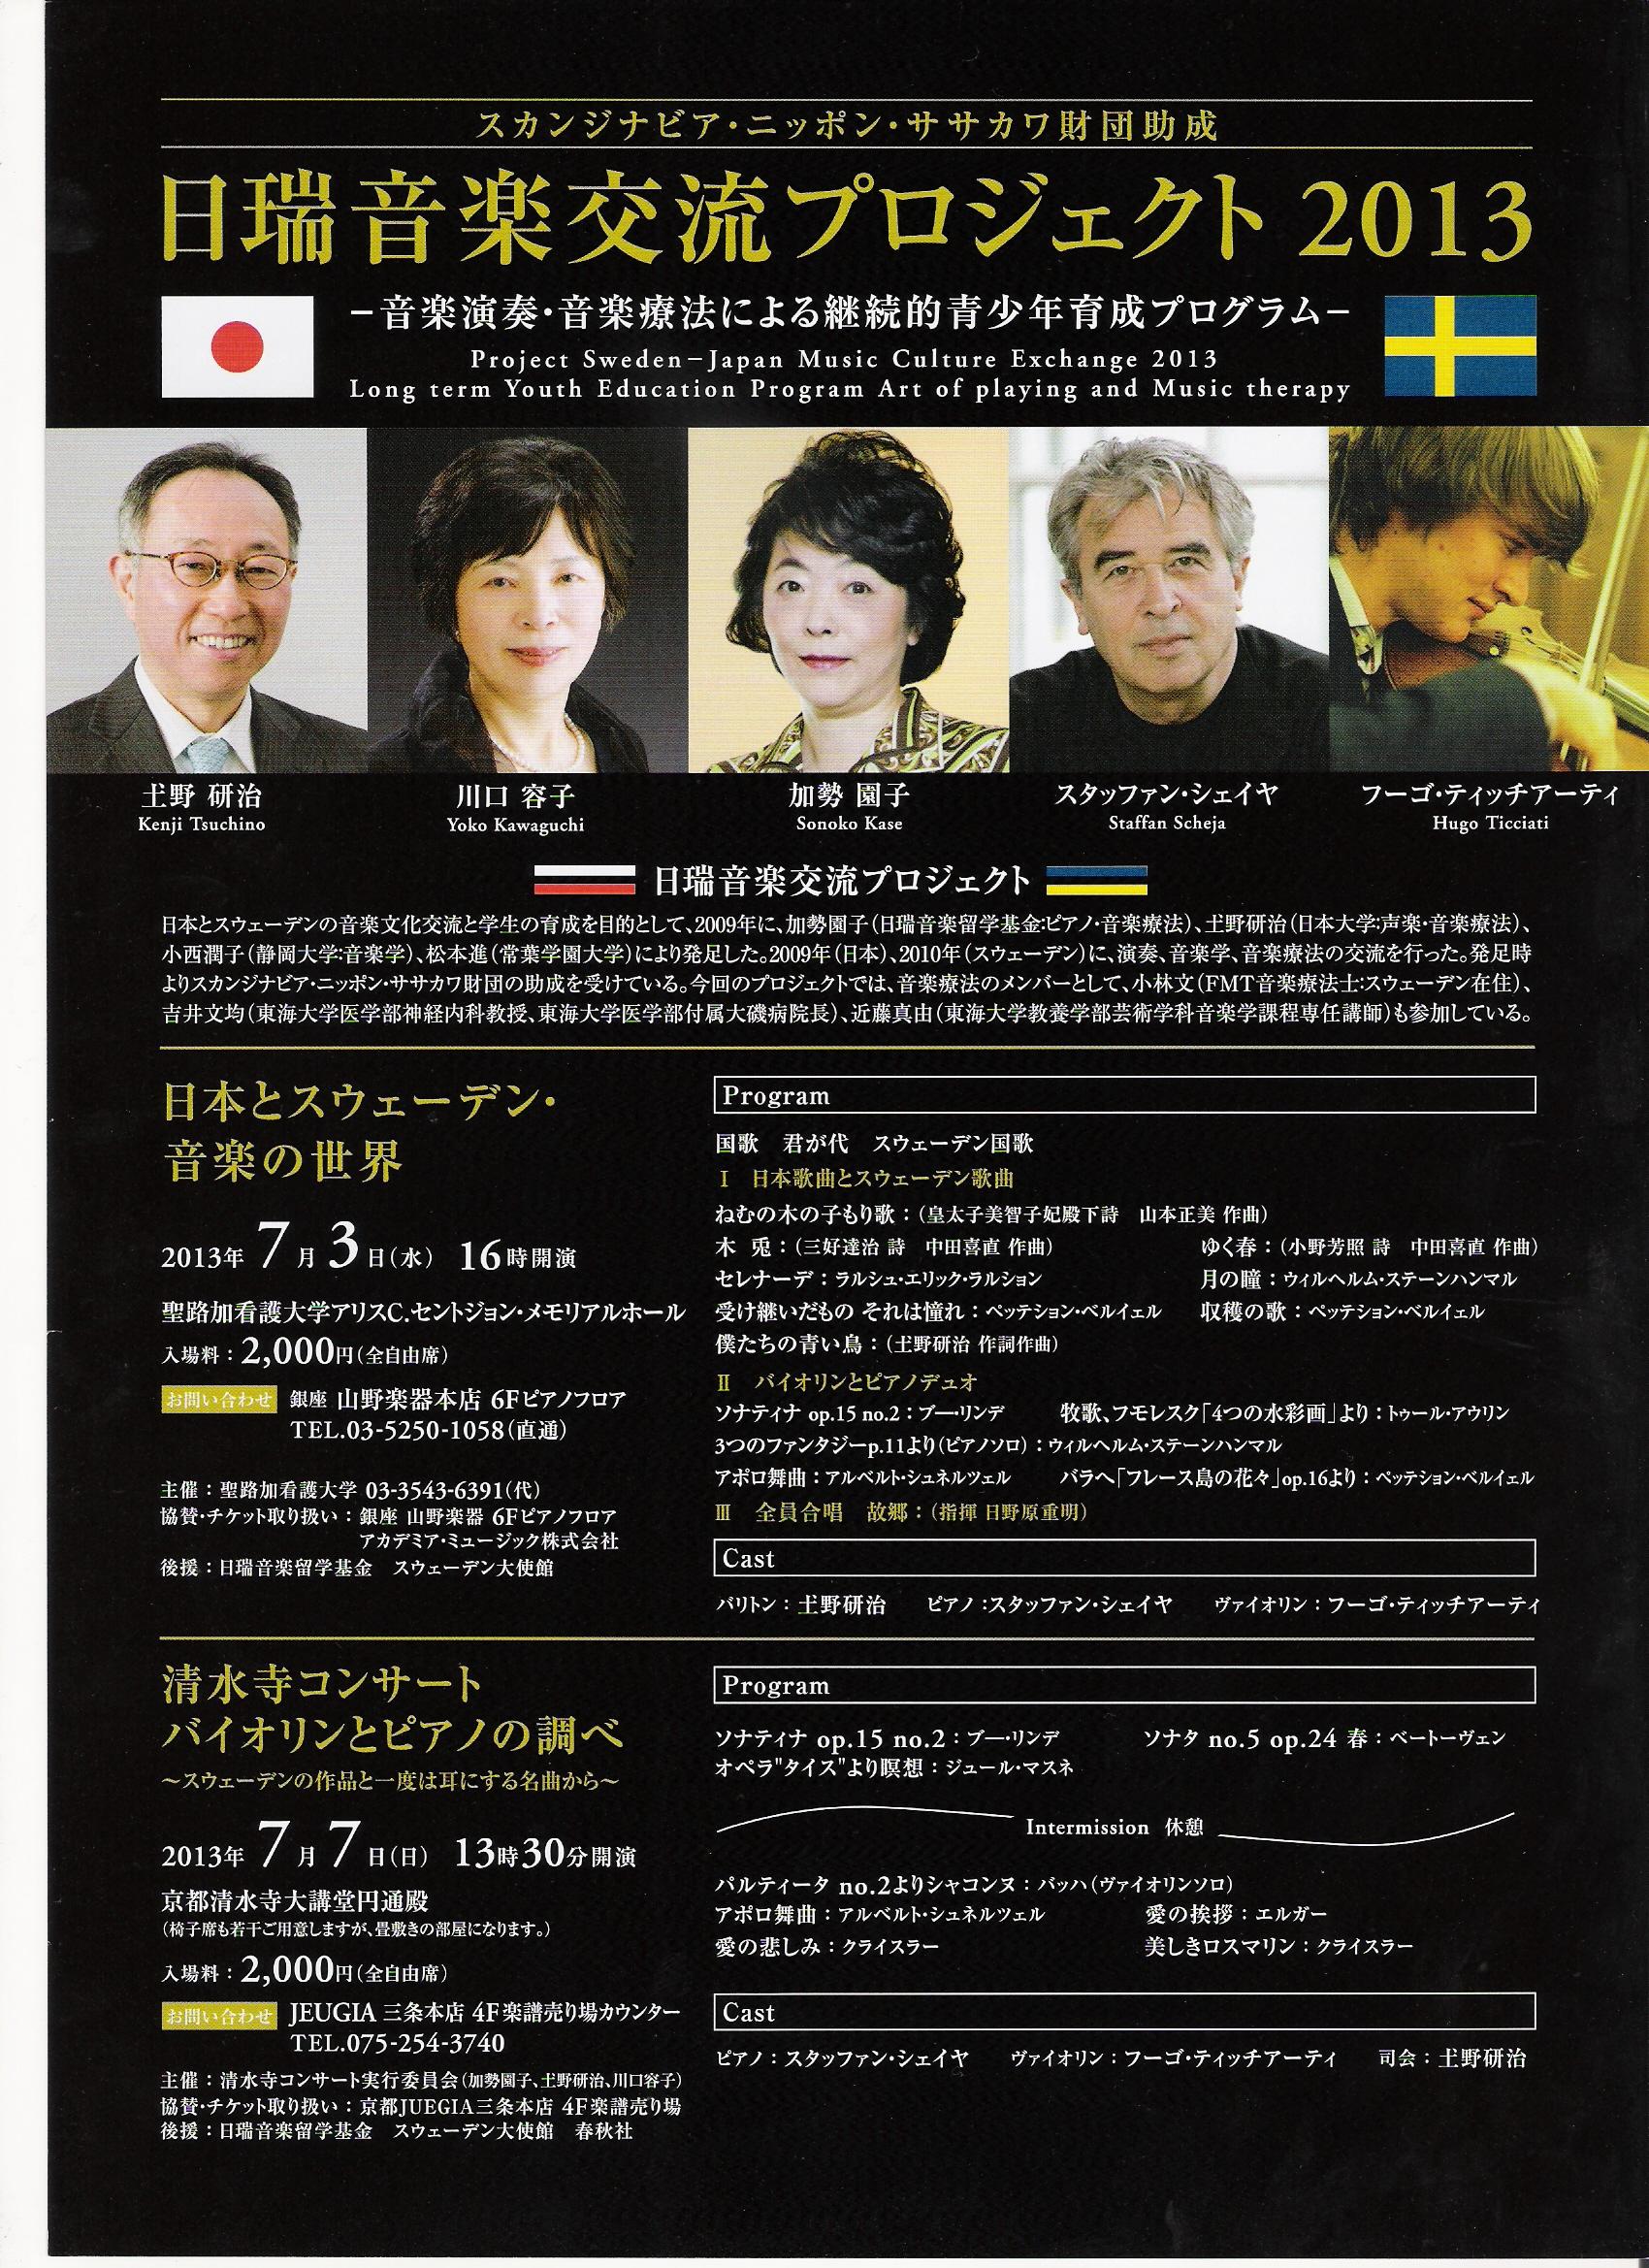 Project_Sweden_Japan_2013-0001.jpg